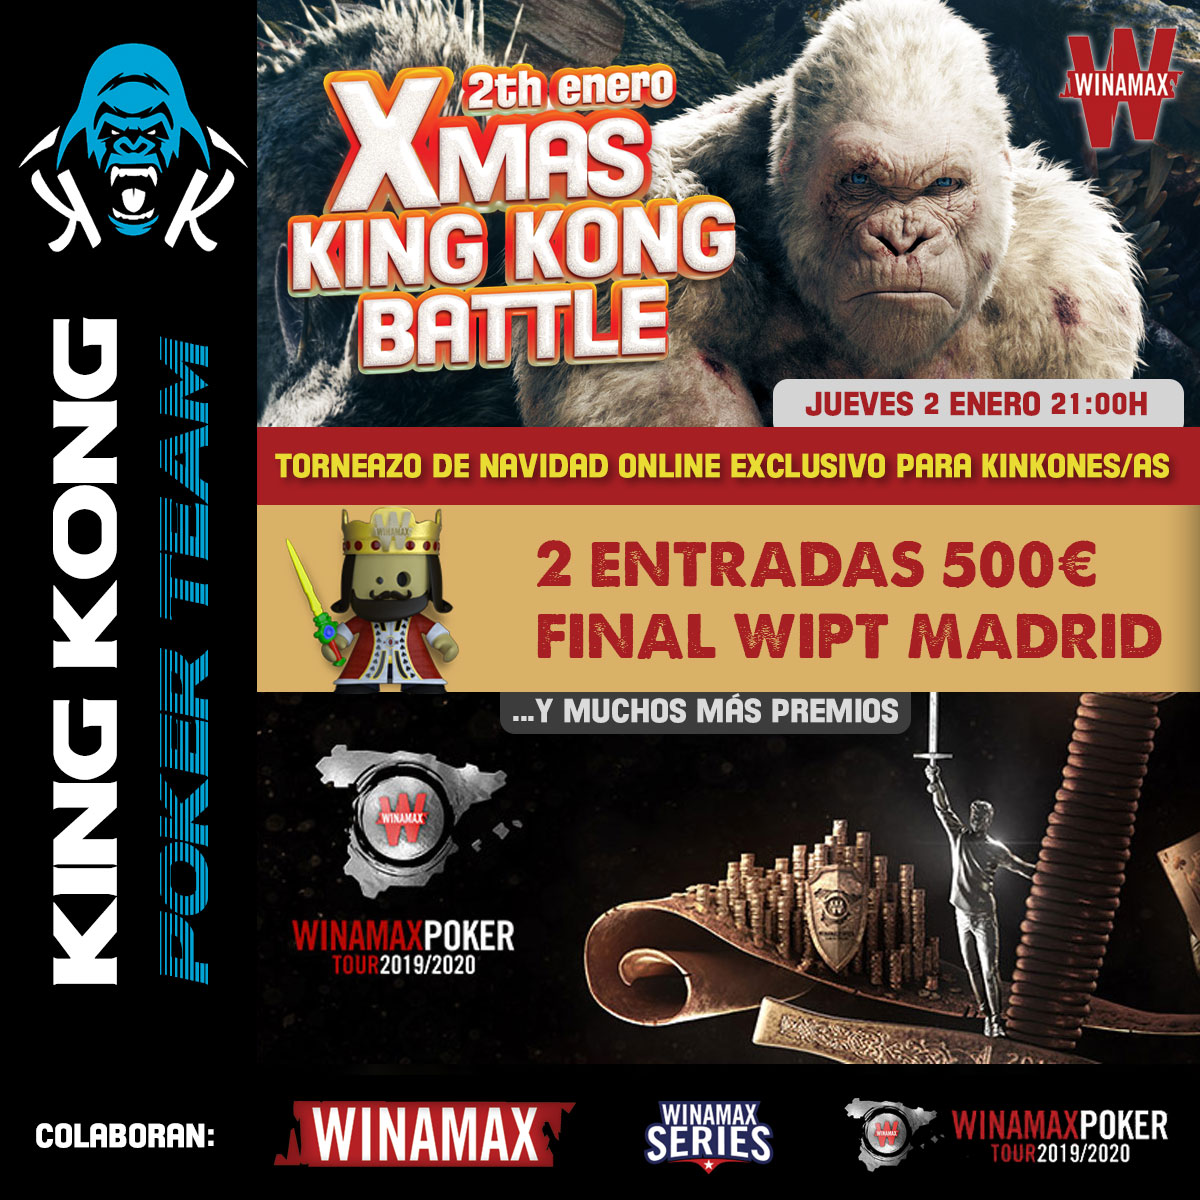 20181207_PROMO_XMAS_King_Kong_Battle_banner_wipt_web